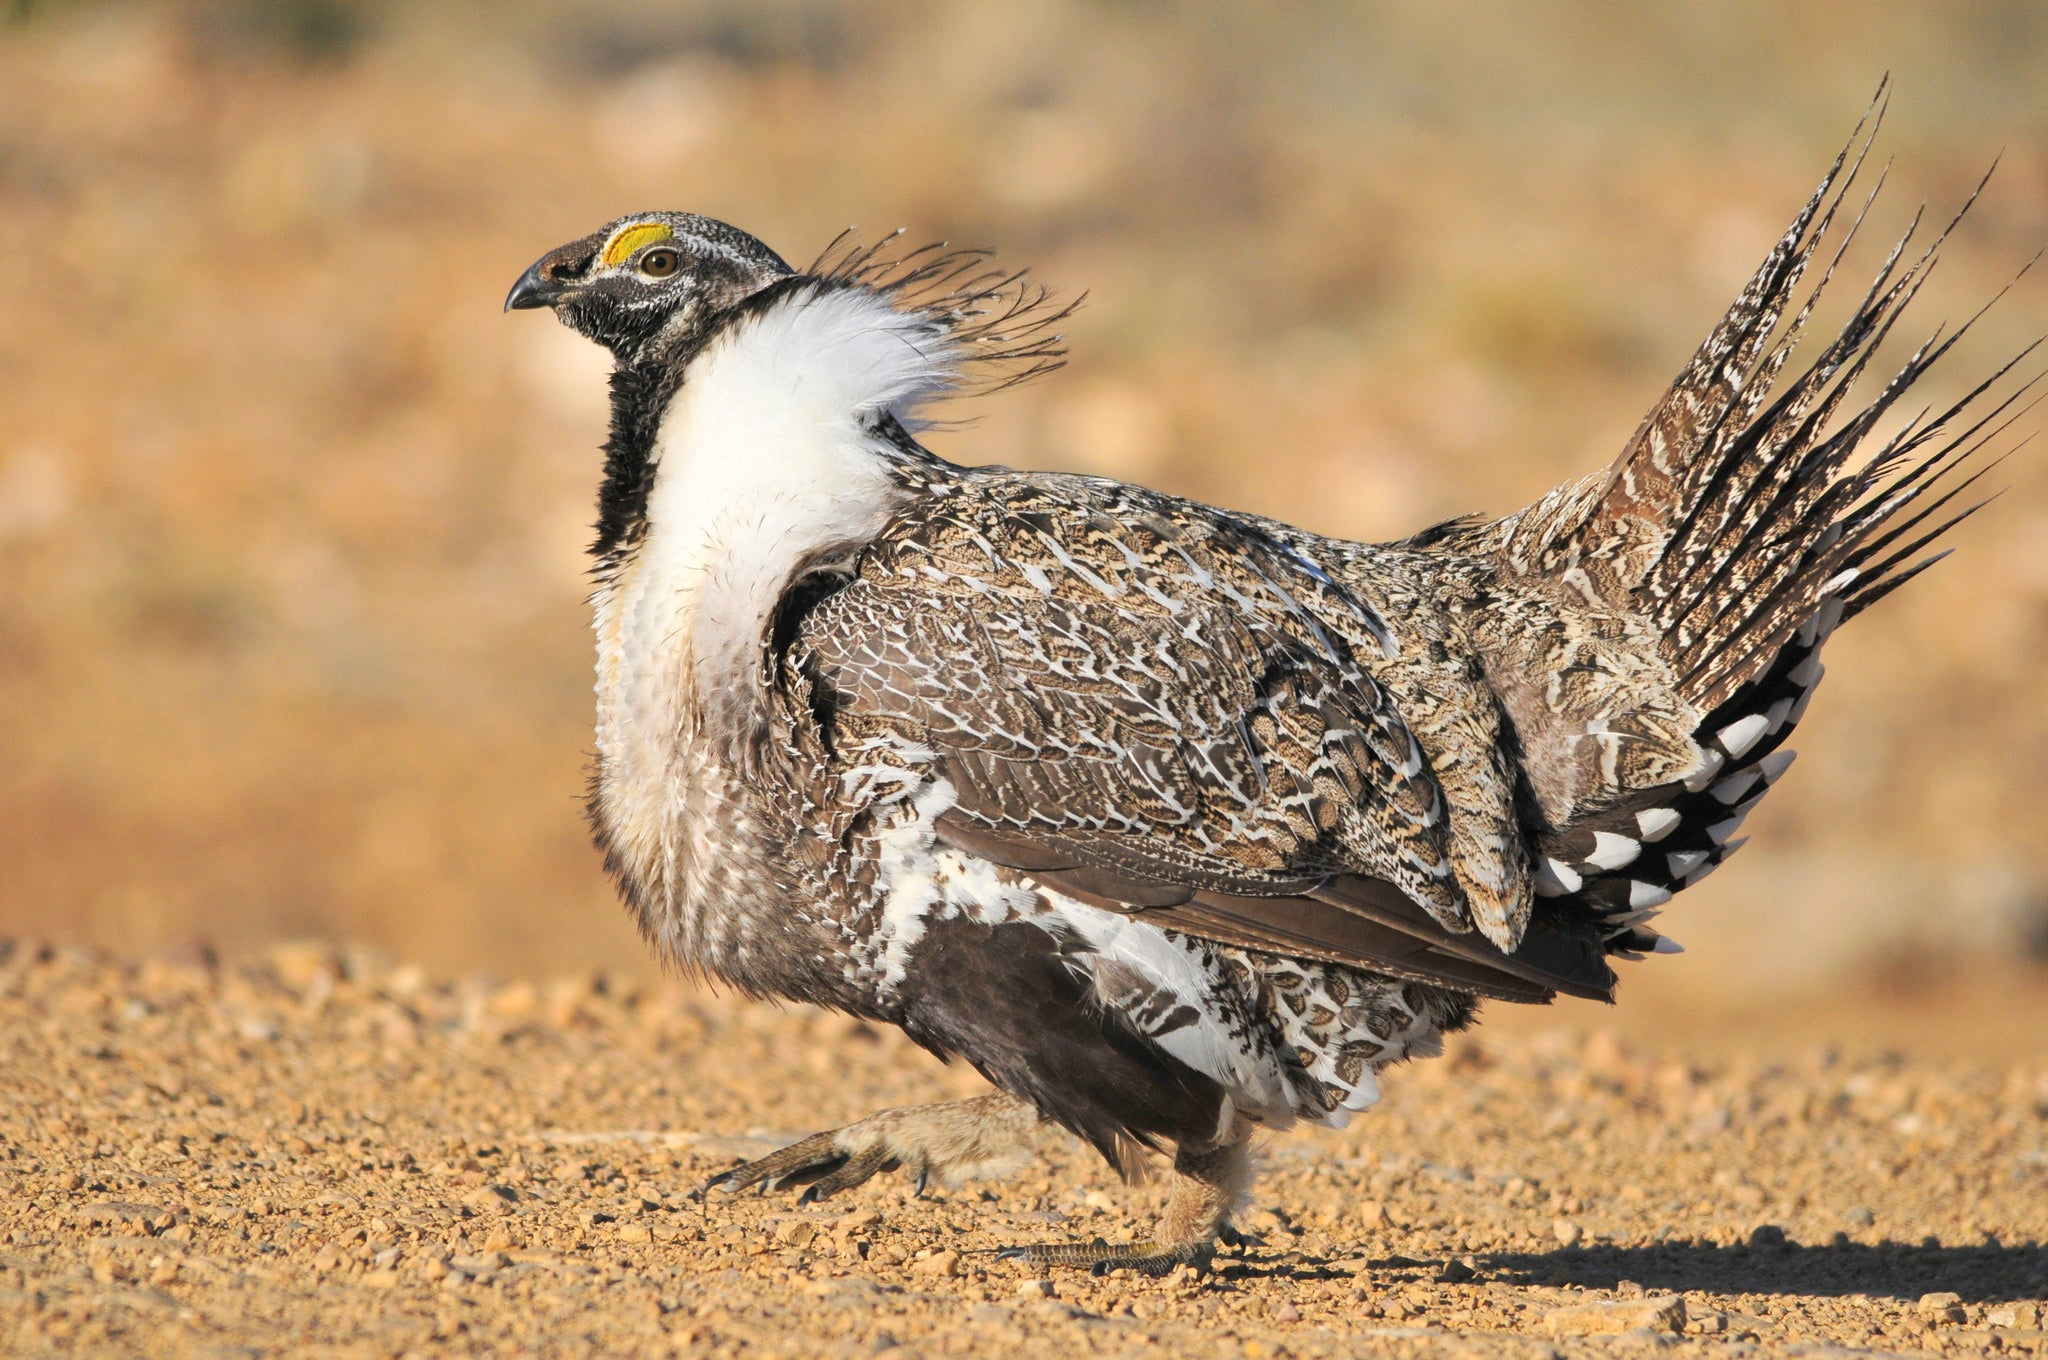 Endangered Species Fight: The Civil War for Sage Grouse Conservation